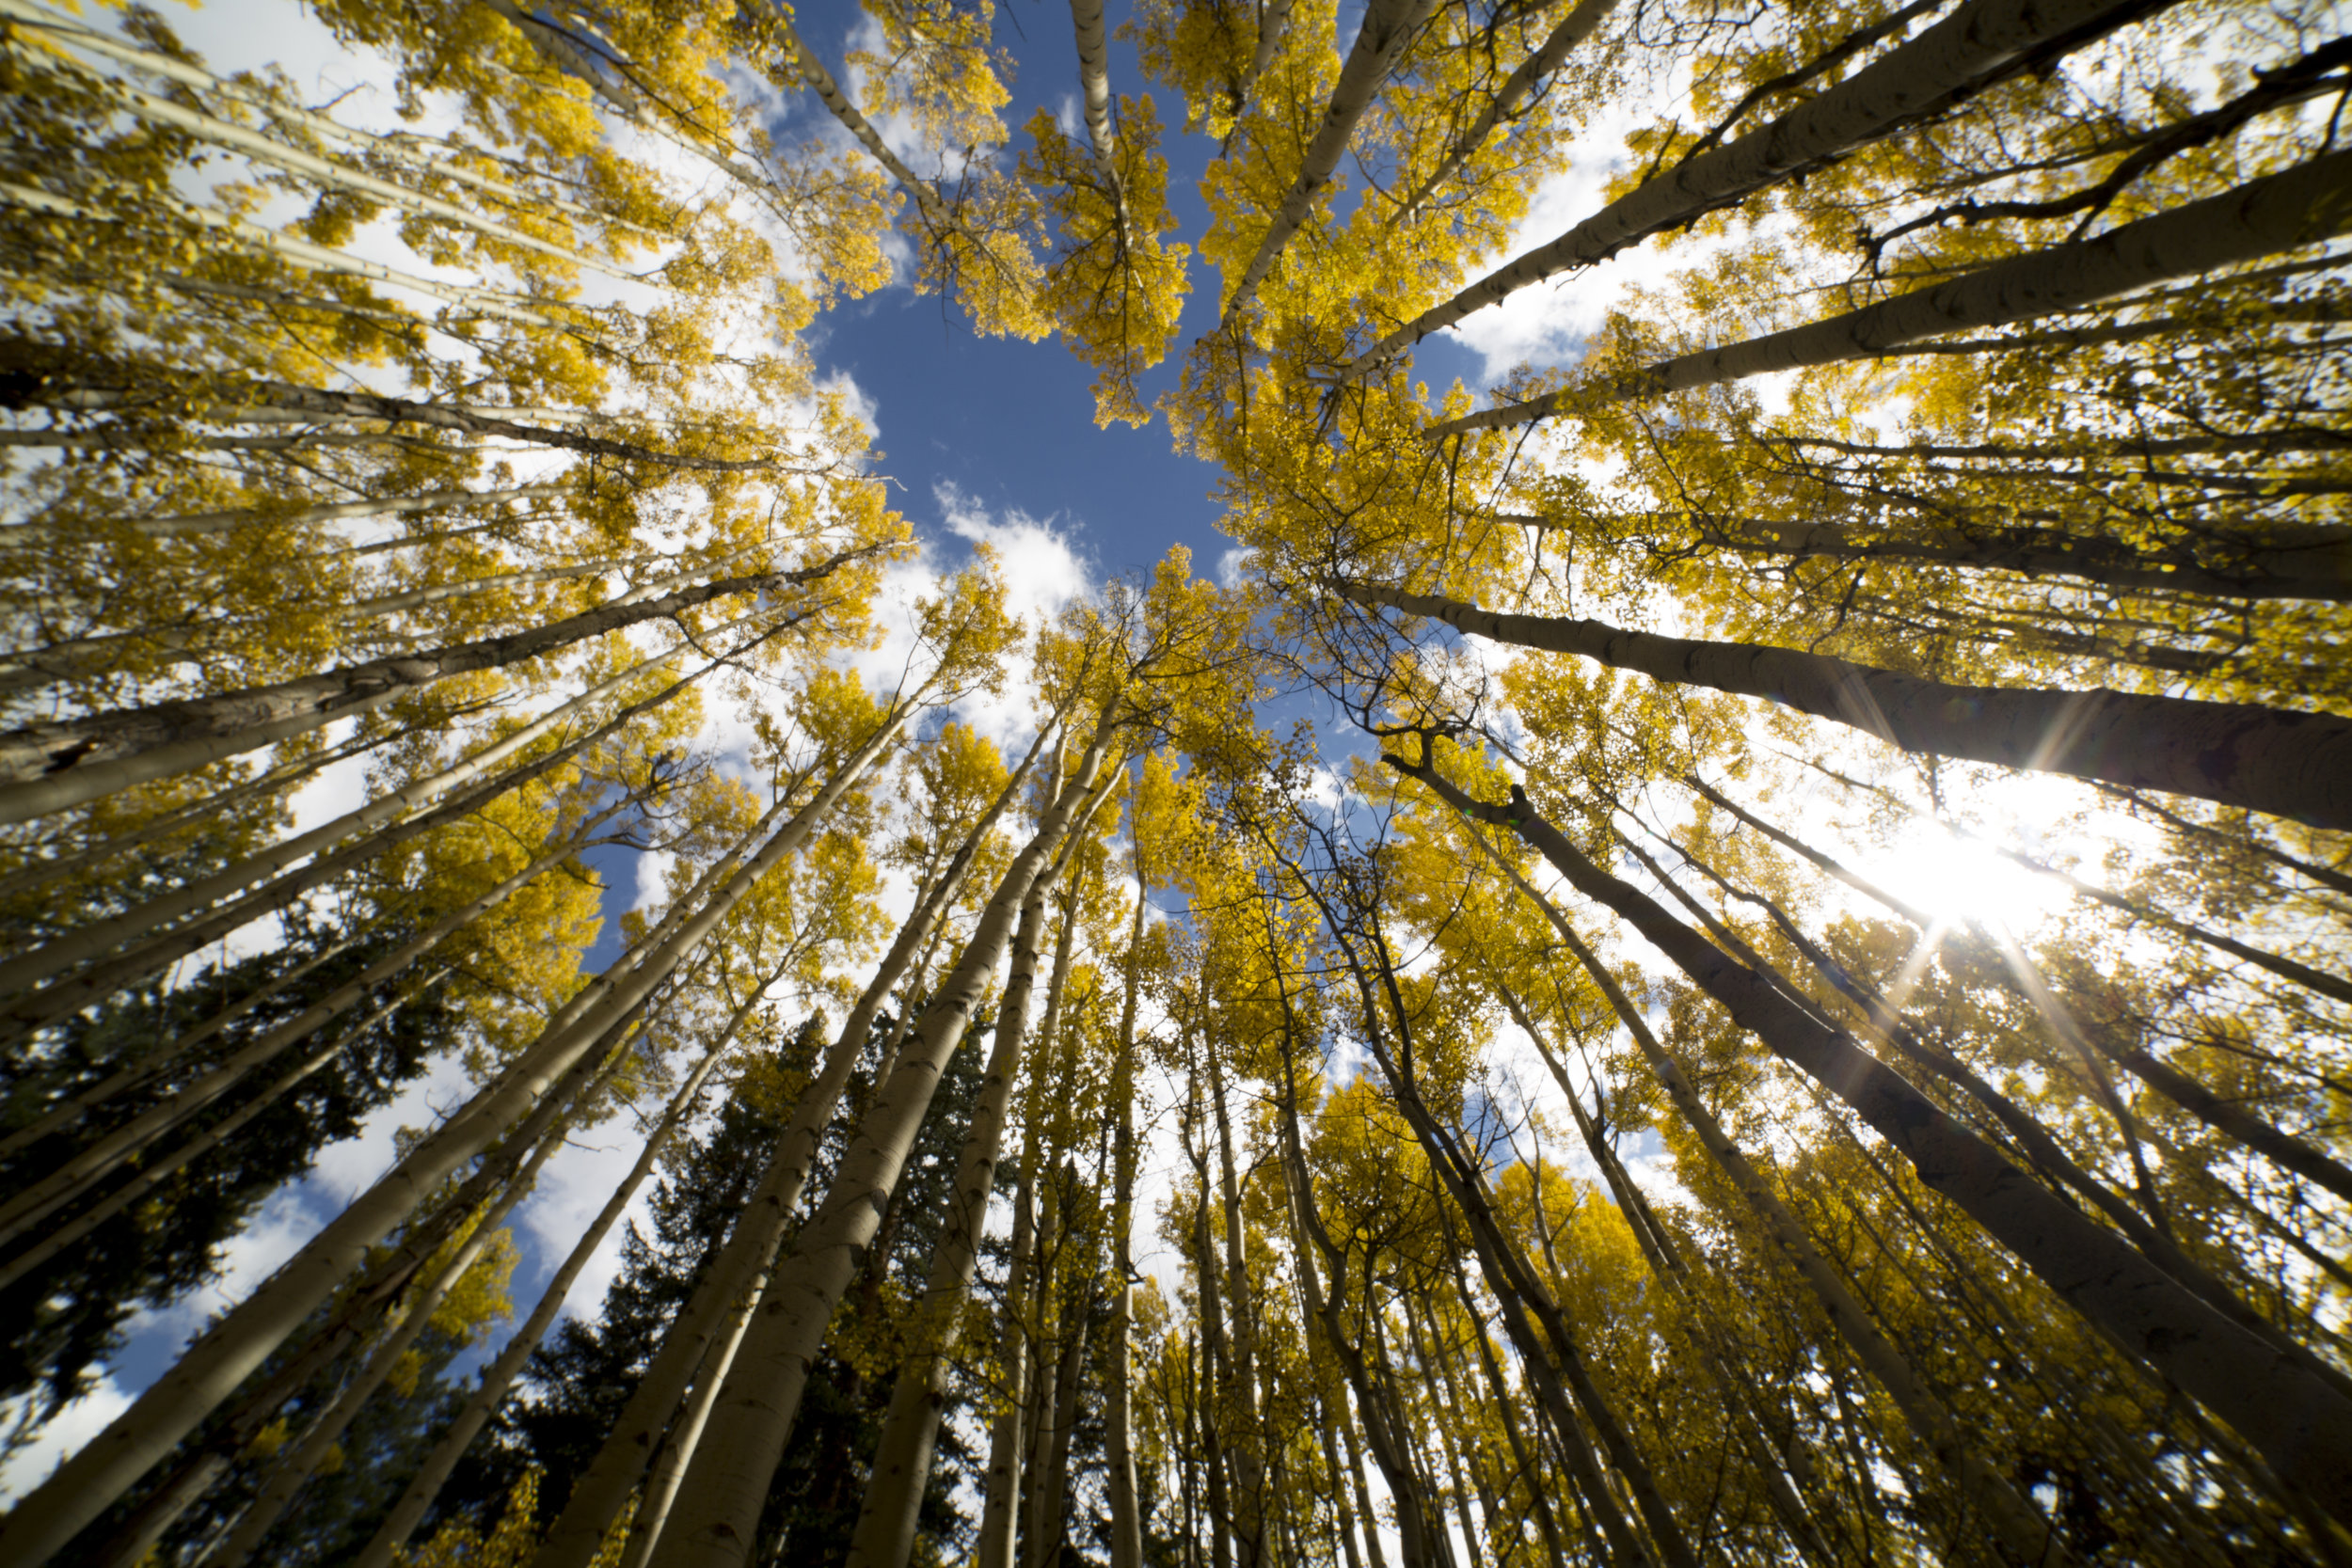 An aspen grove displays its autumn foliage in Colorado's San Juan Mountains.